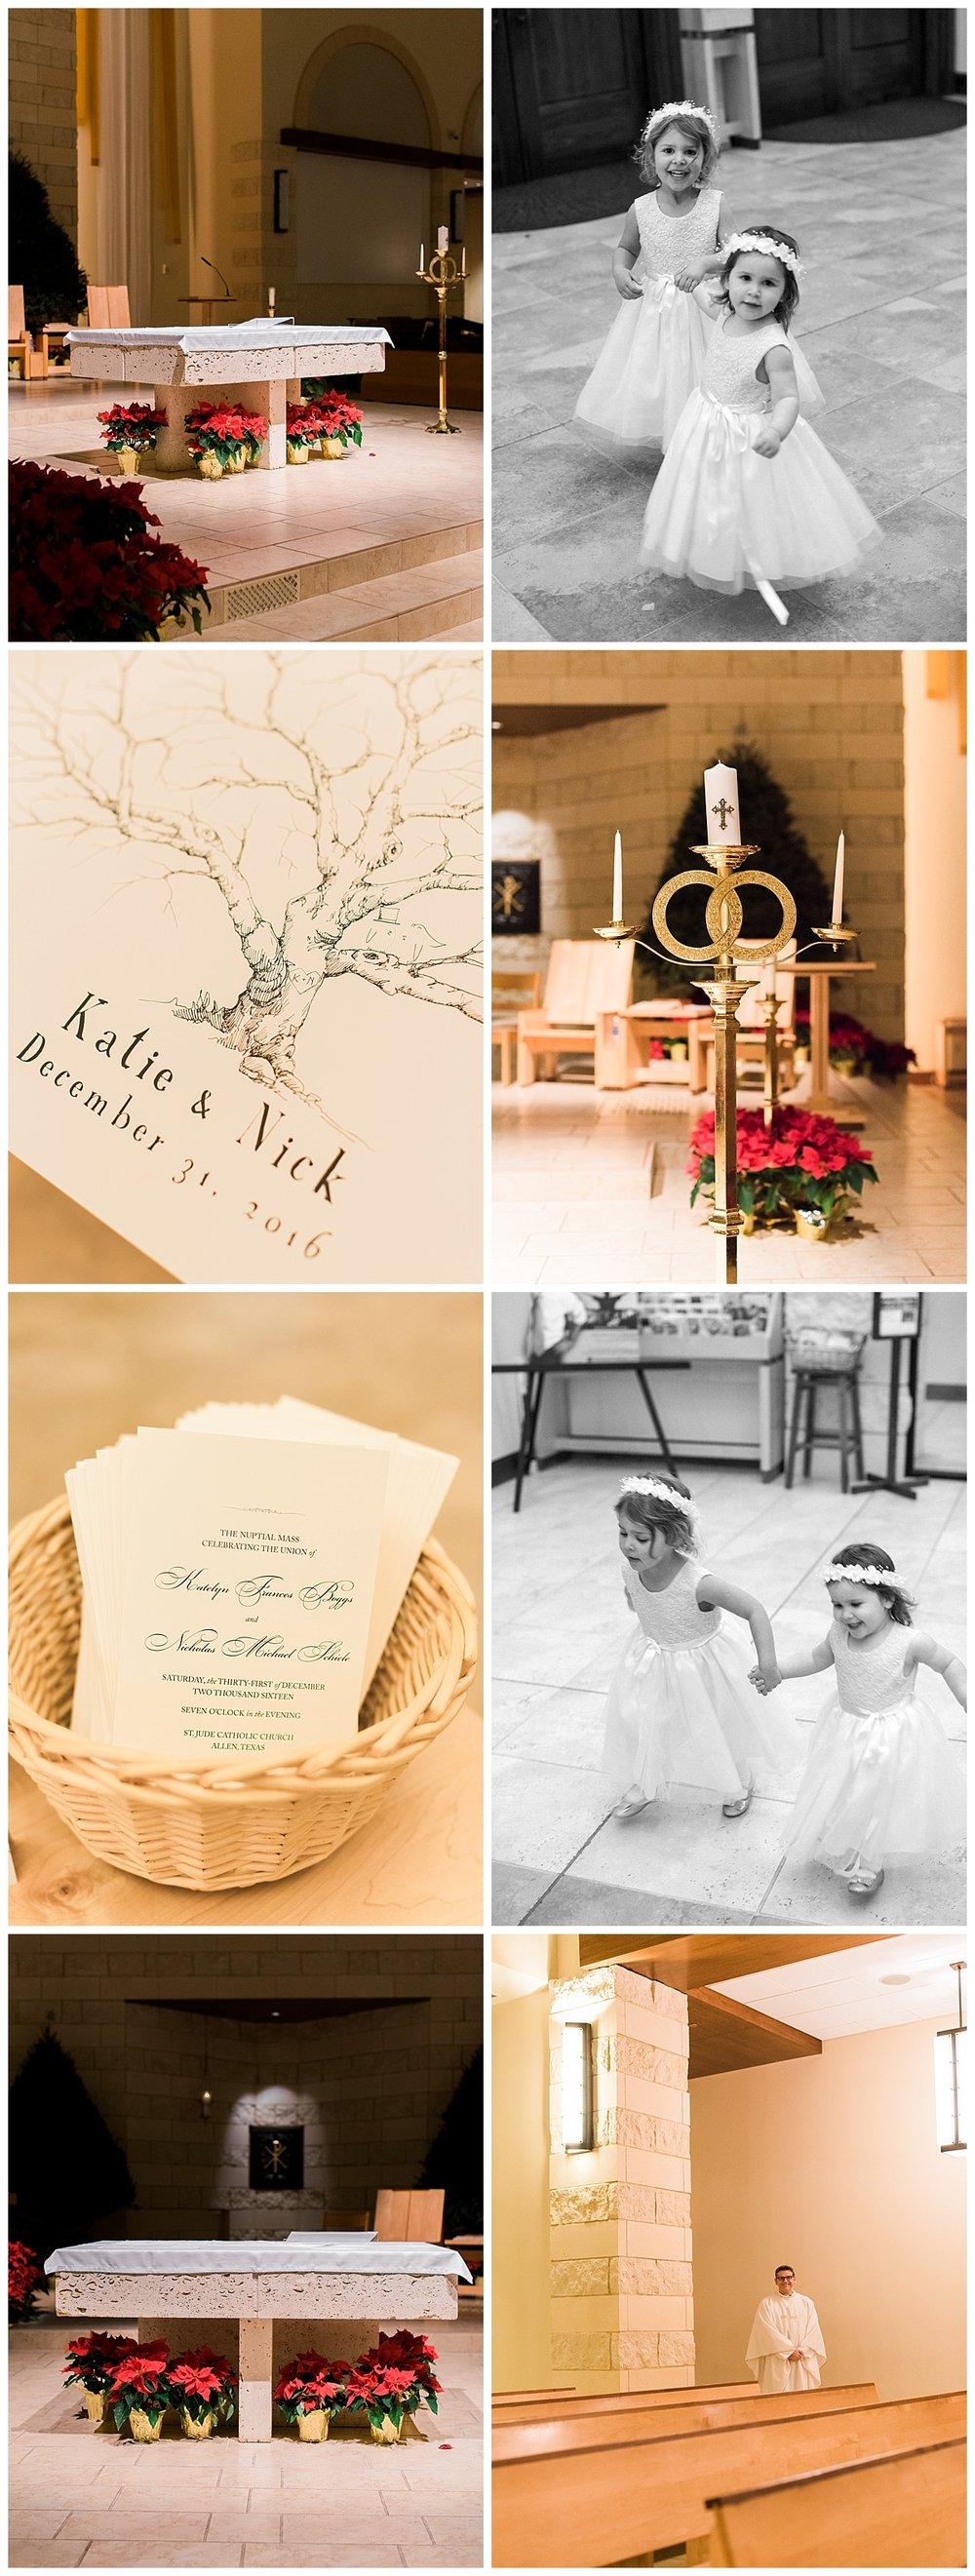 the-cotton-mill-wedding-ar-photography-15.jpg